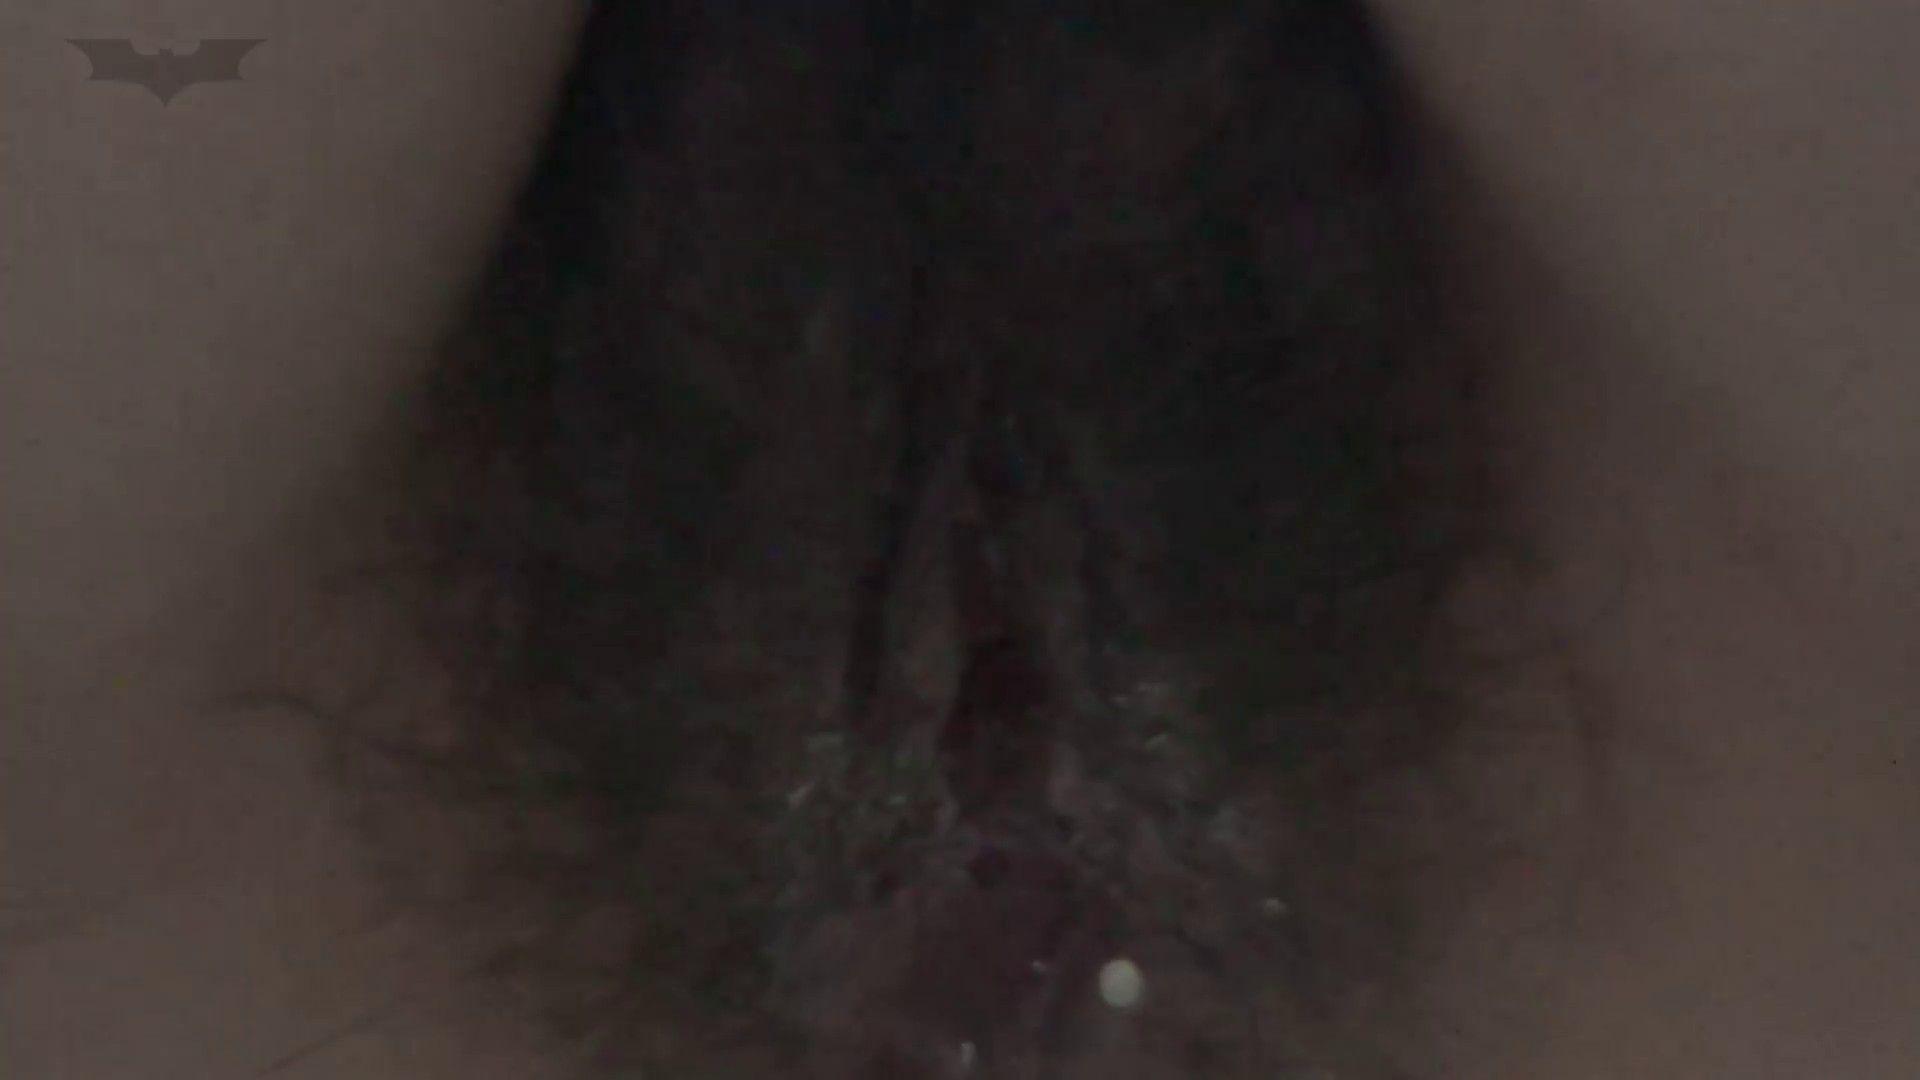 JD盗撮 美女の洗面所の秘密 Vol.28 OLのボディ  55PIX 5